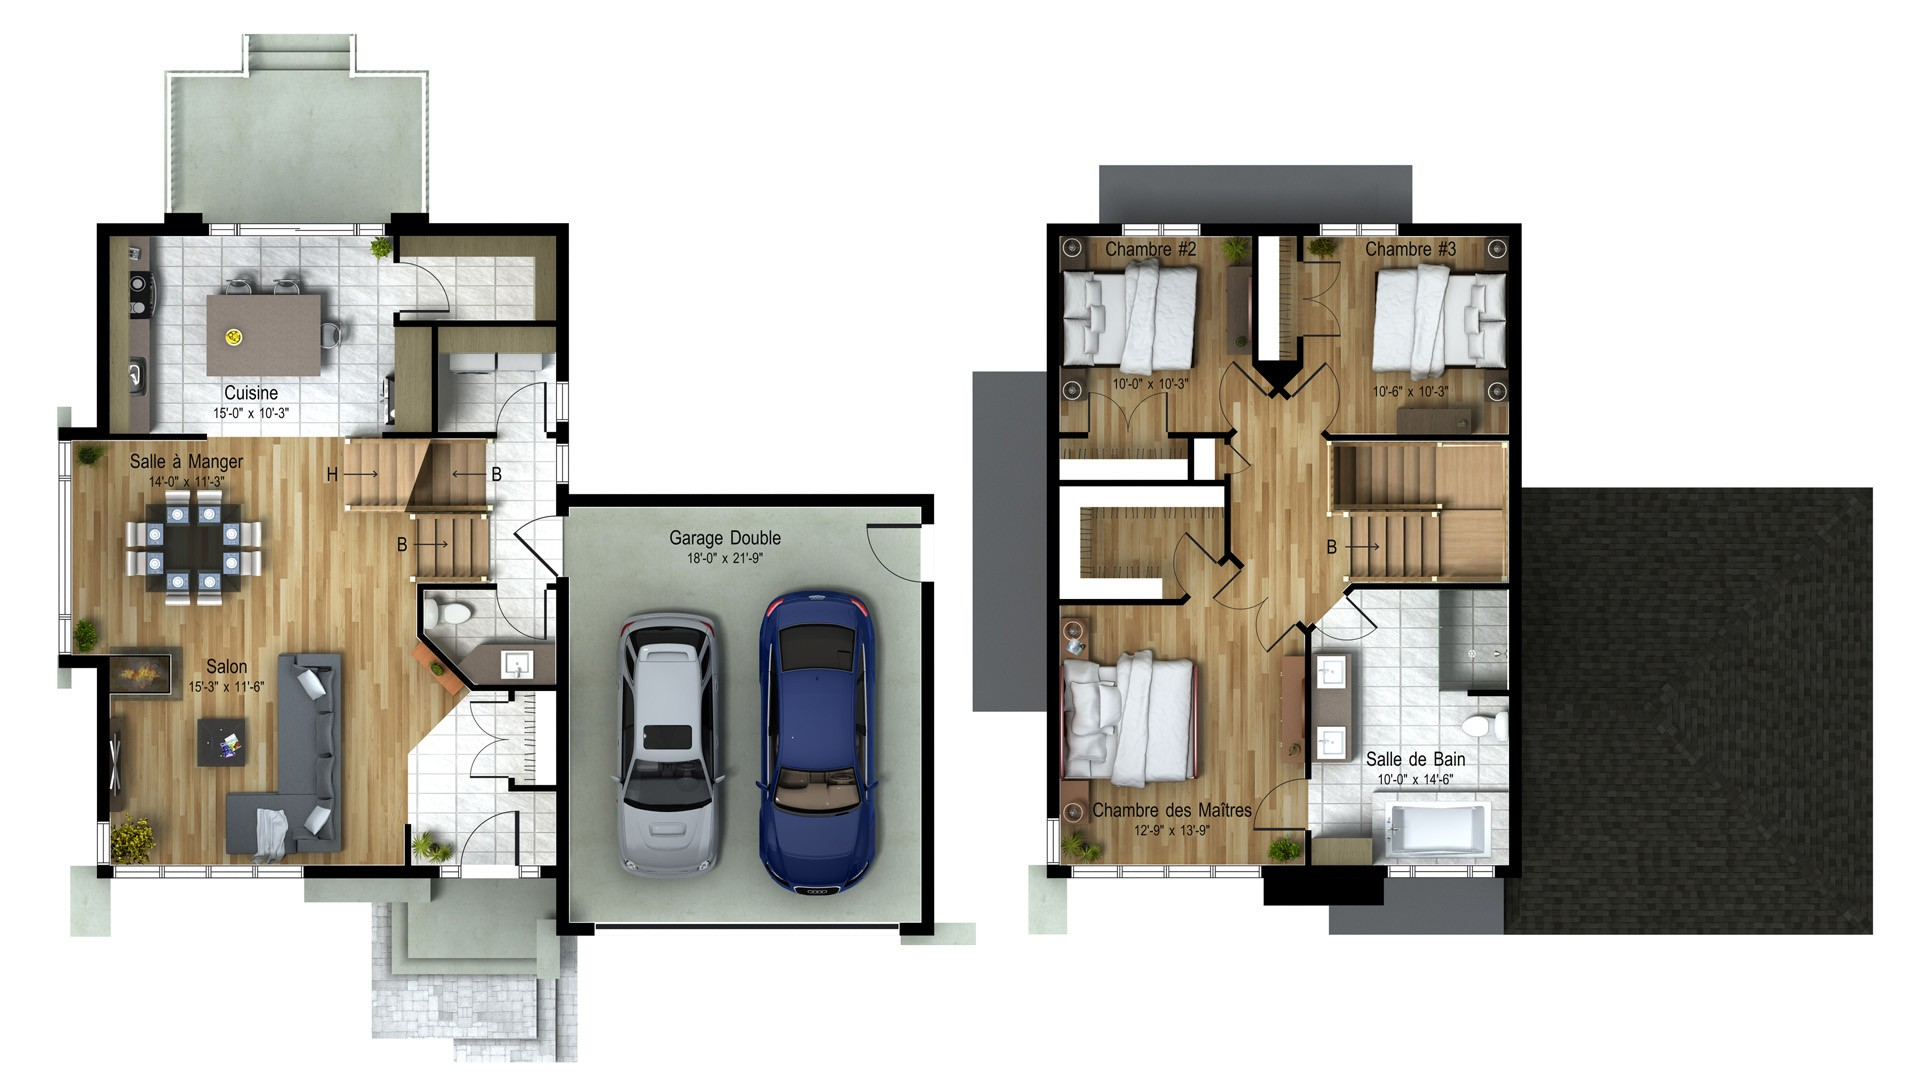 Cottage_Contemporain_Estrella_Plan maison de prestige_Domicil